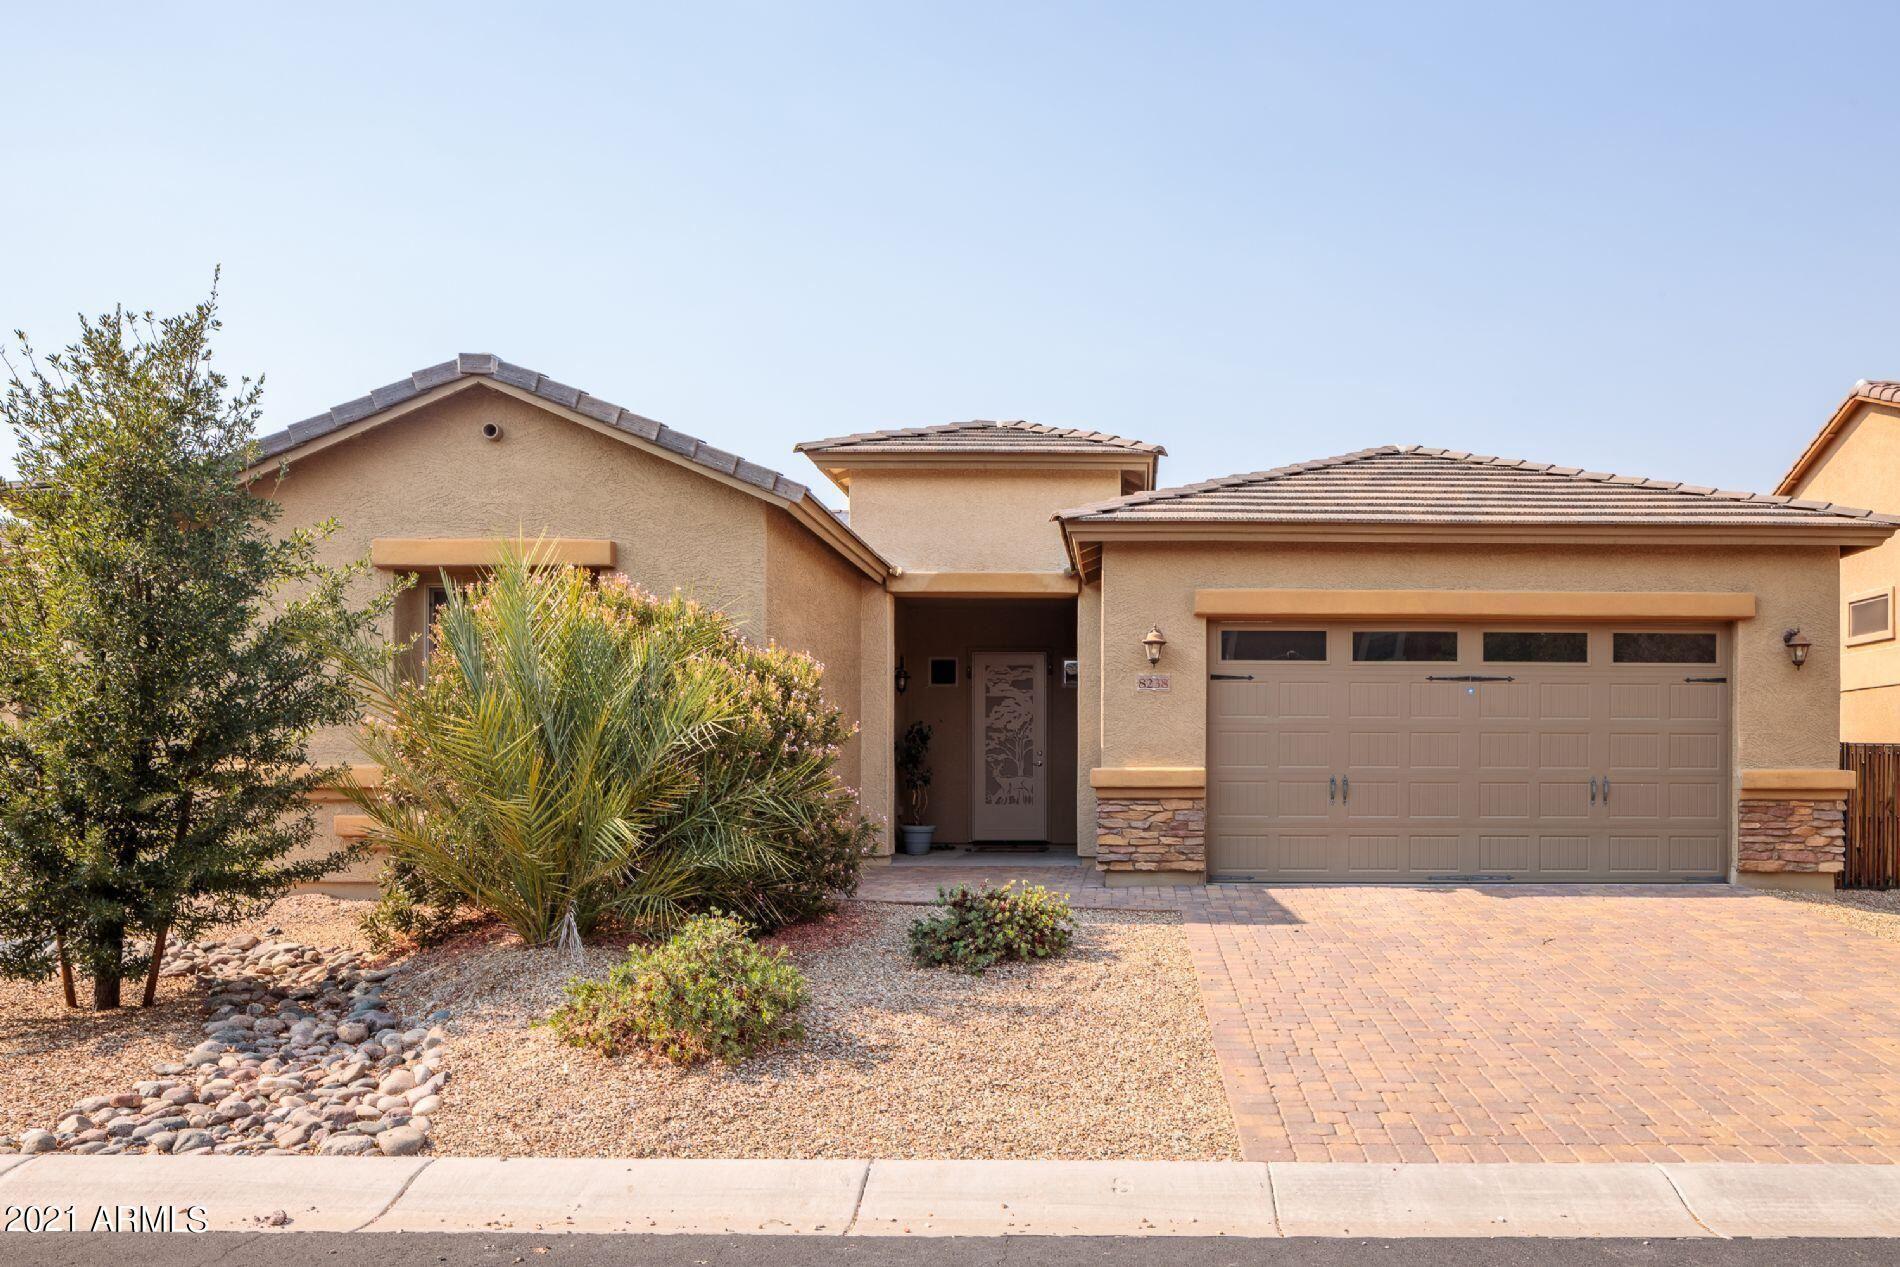 8238 W ROCK SPRINGS Drive, Peoria, AZ 85383 - MLS#: 6252776